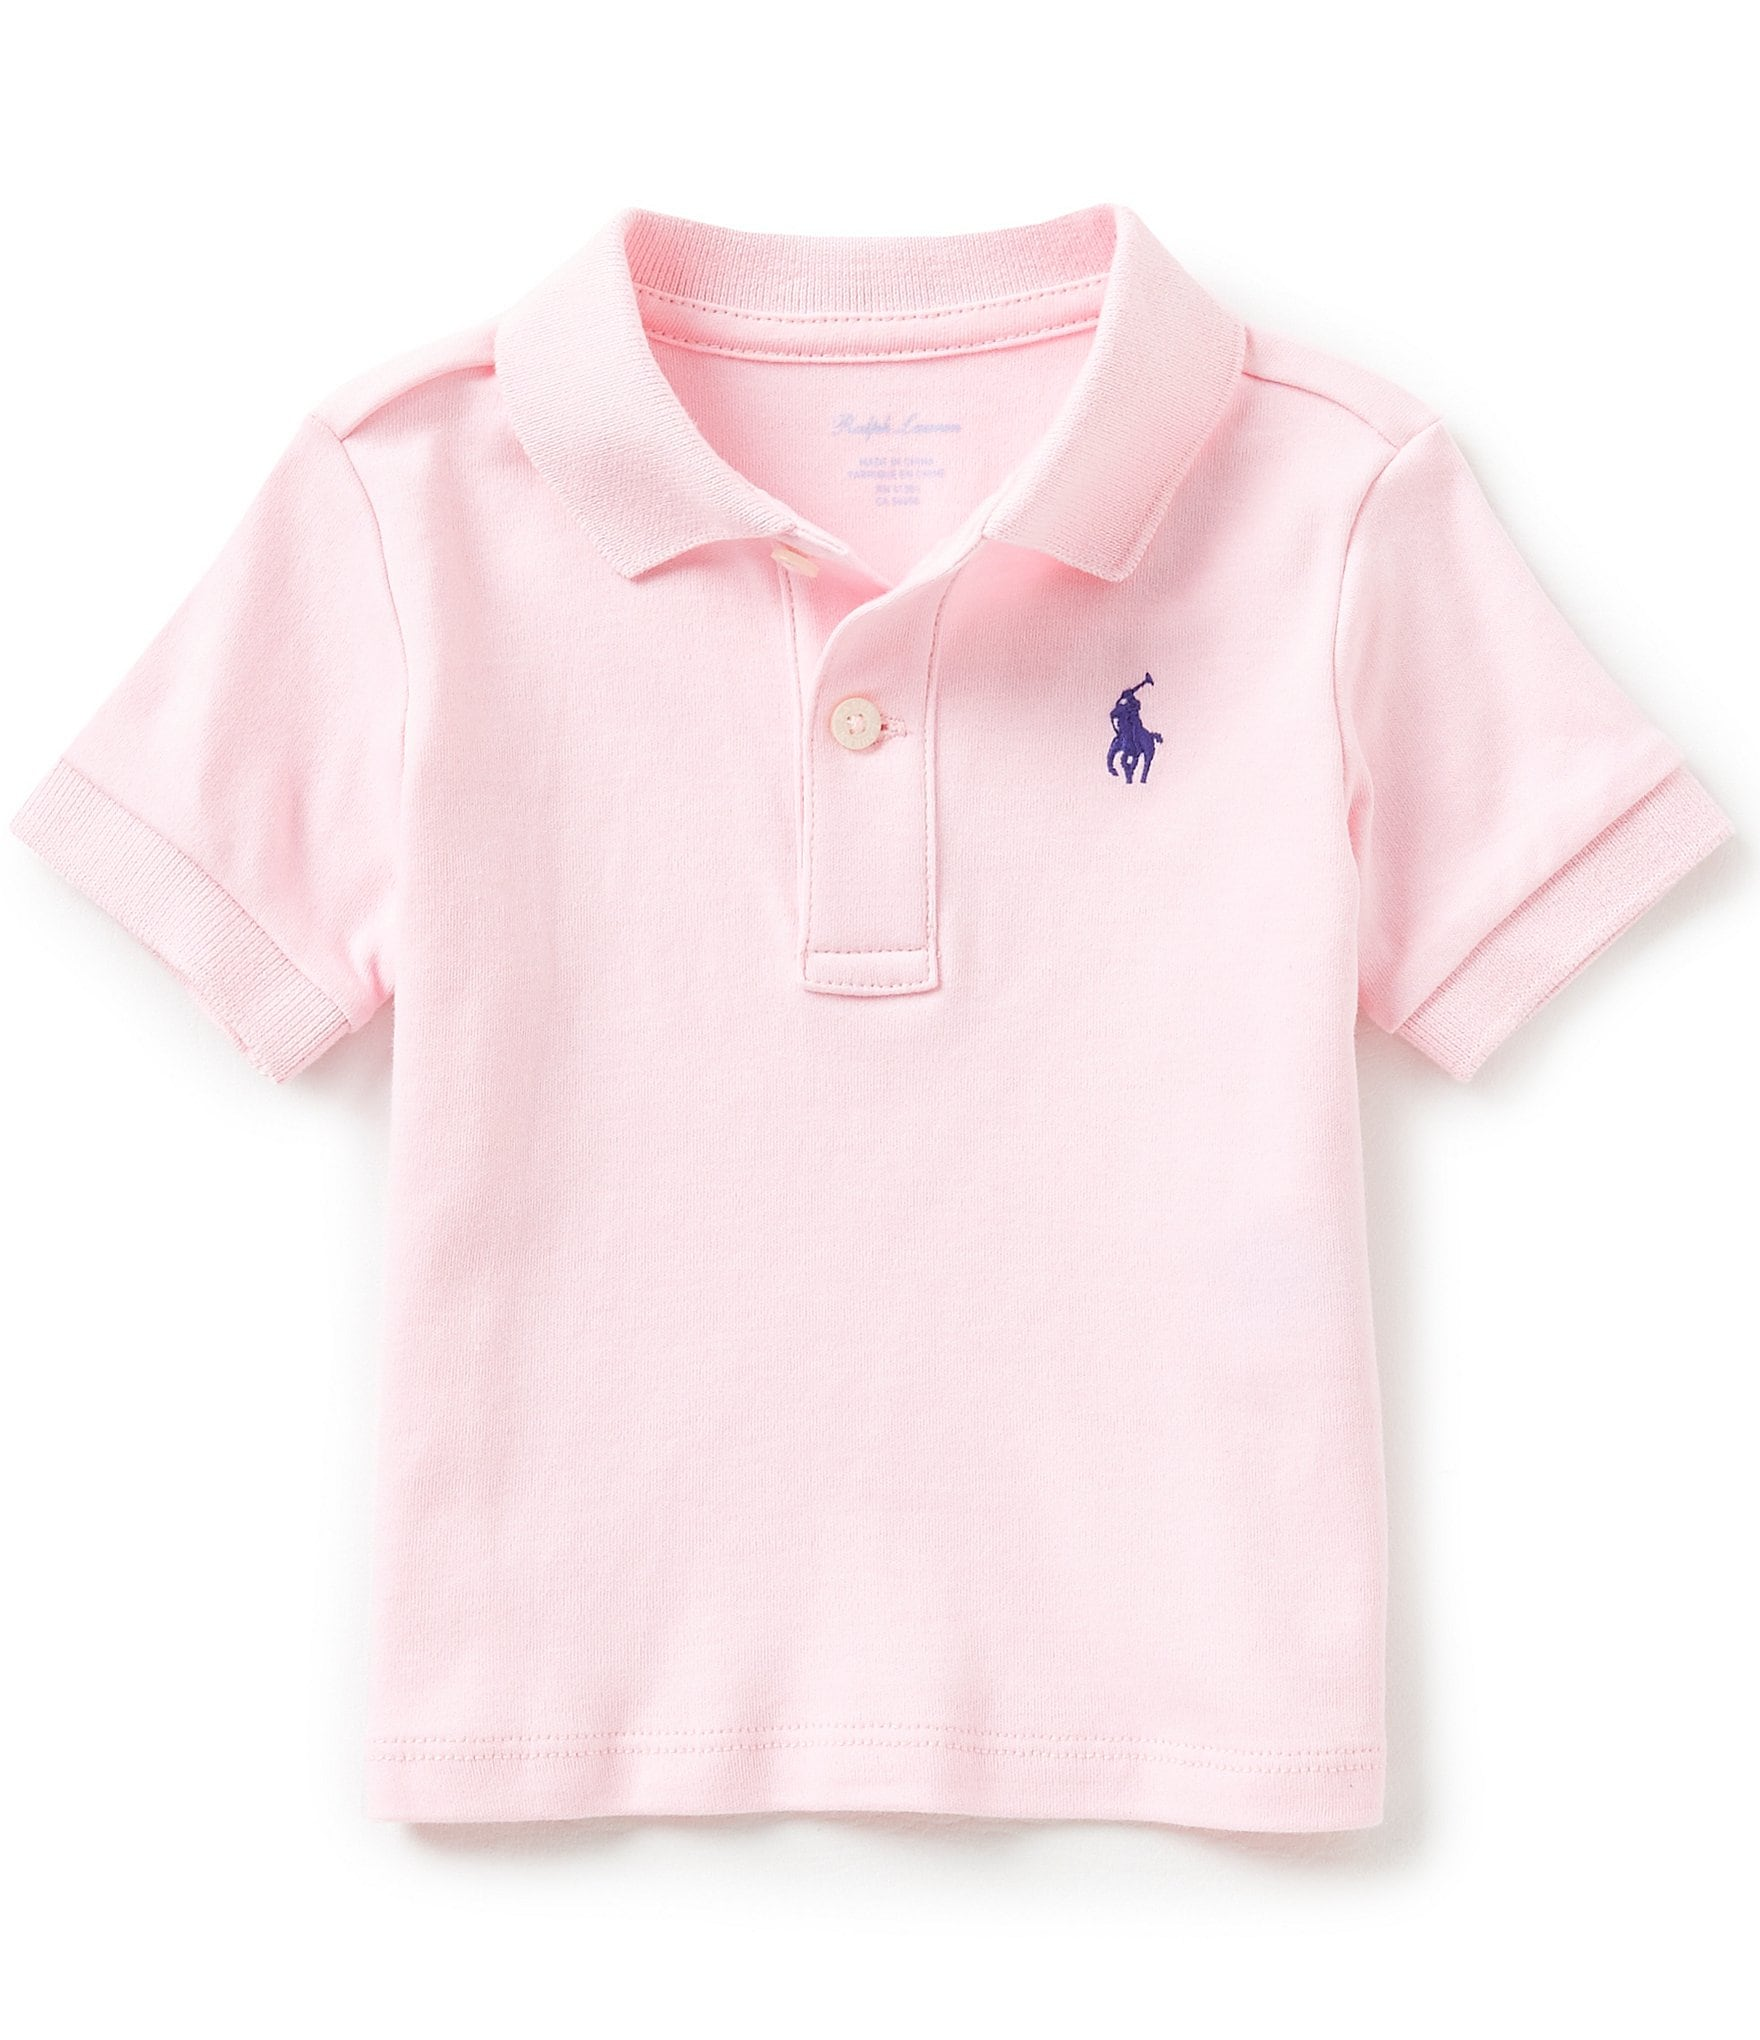 391584d292f1f Ralph Lauren Baby Boys Clothing